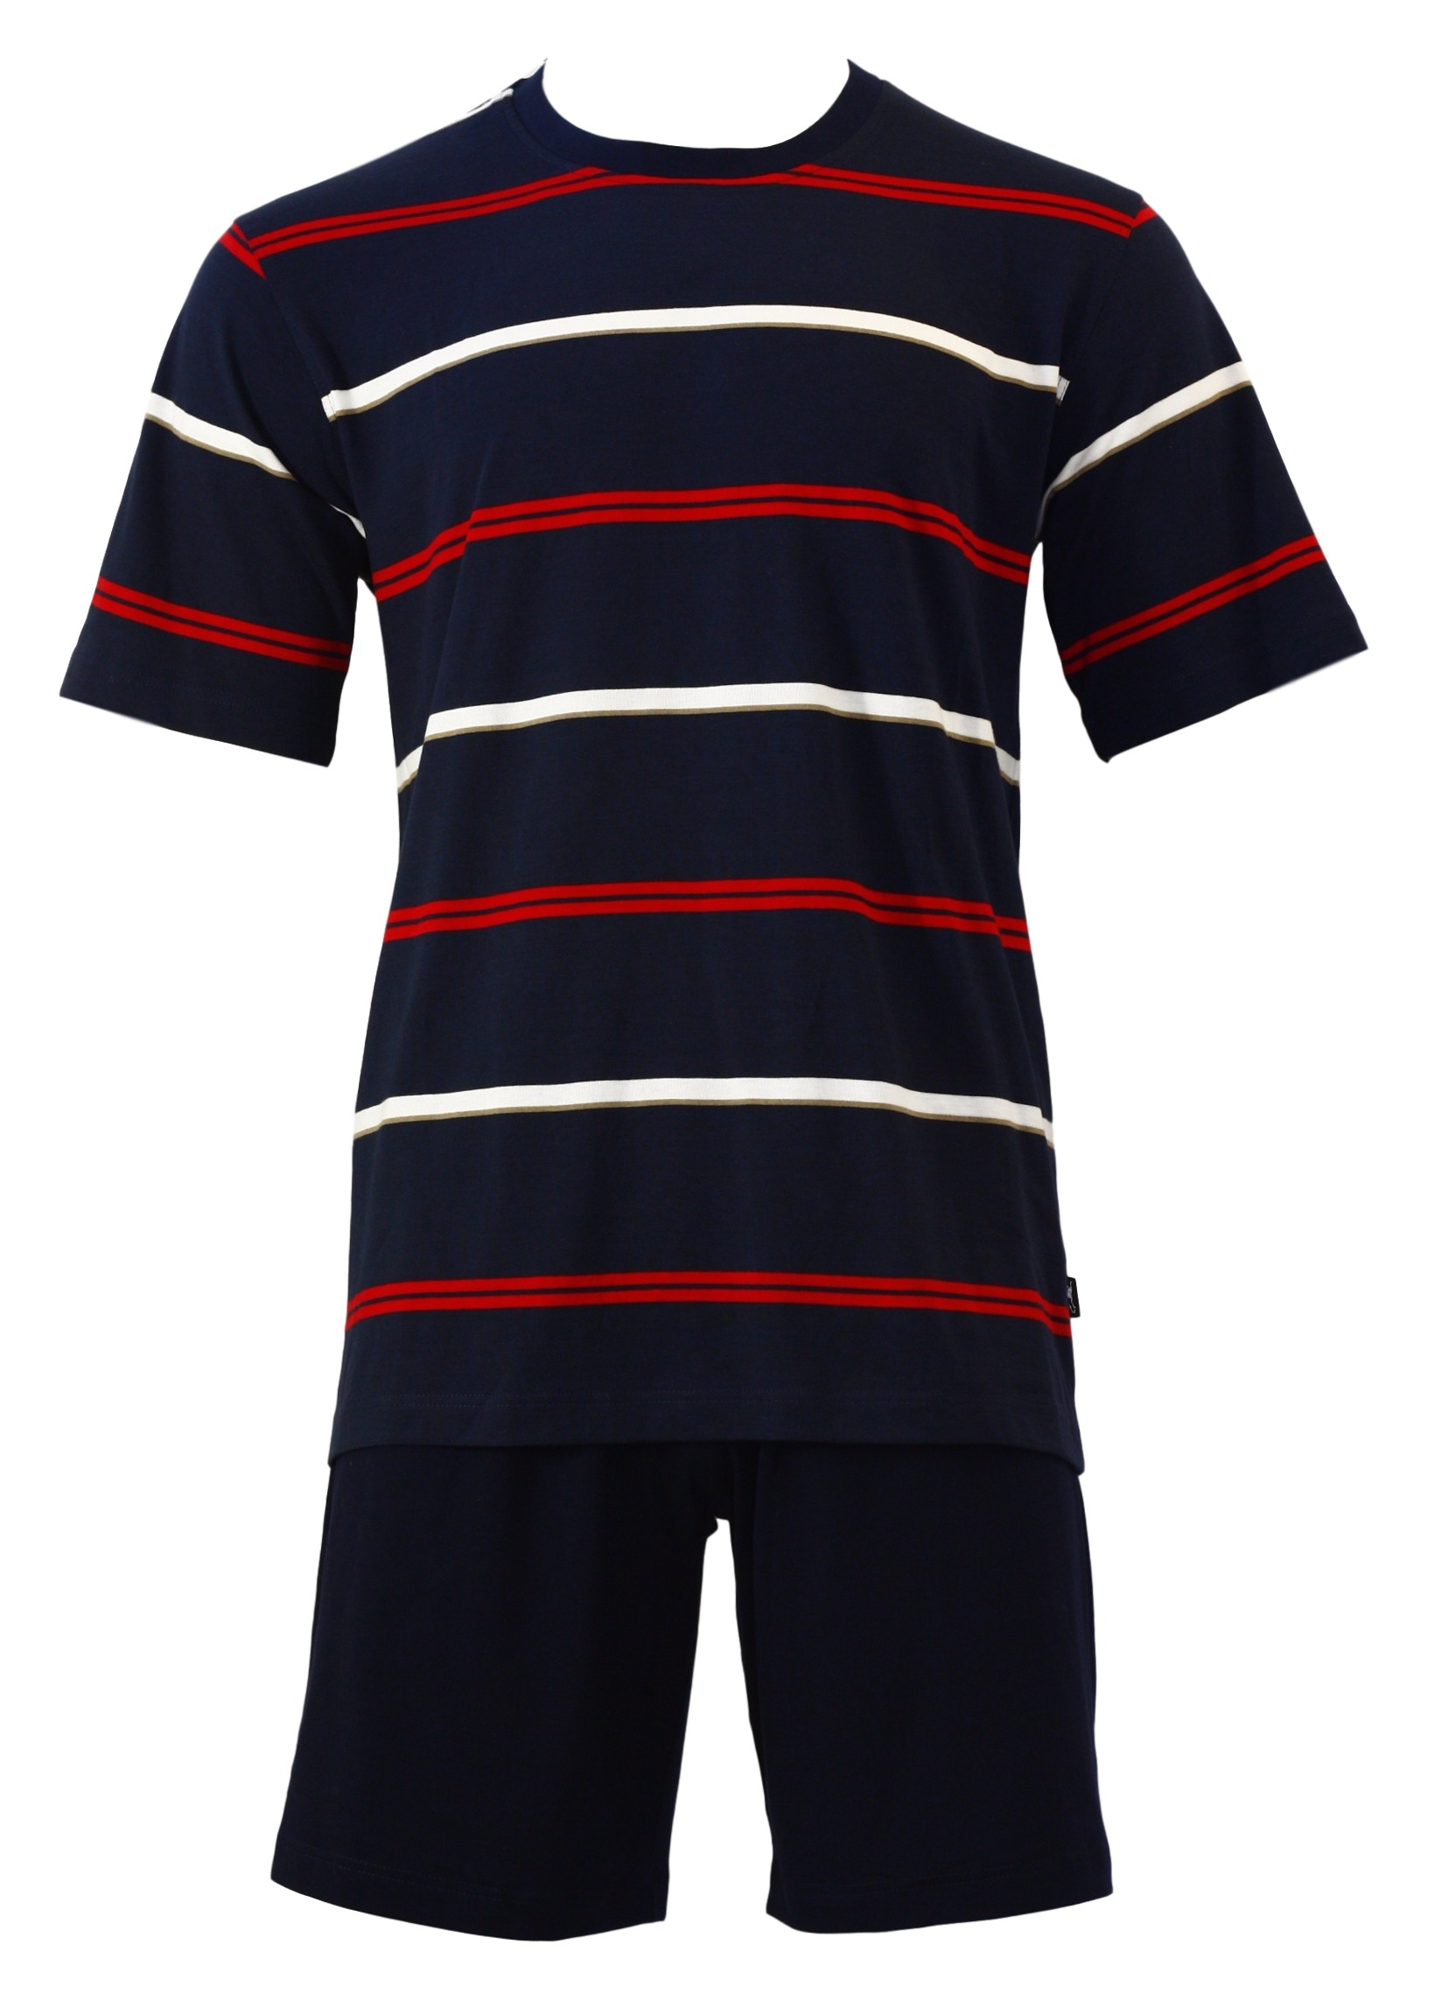 Pánské pyžamo Tuko - Favab Barva: modrá, Velikost: L